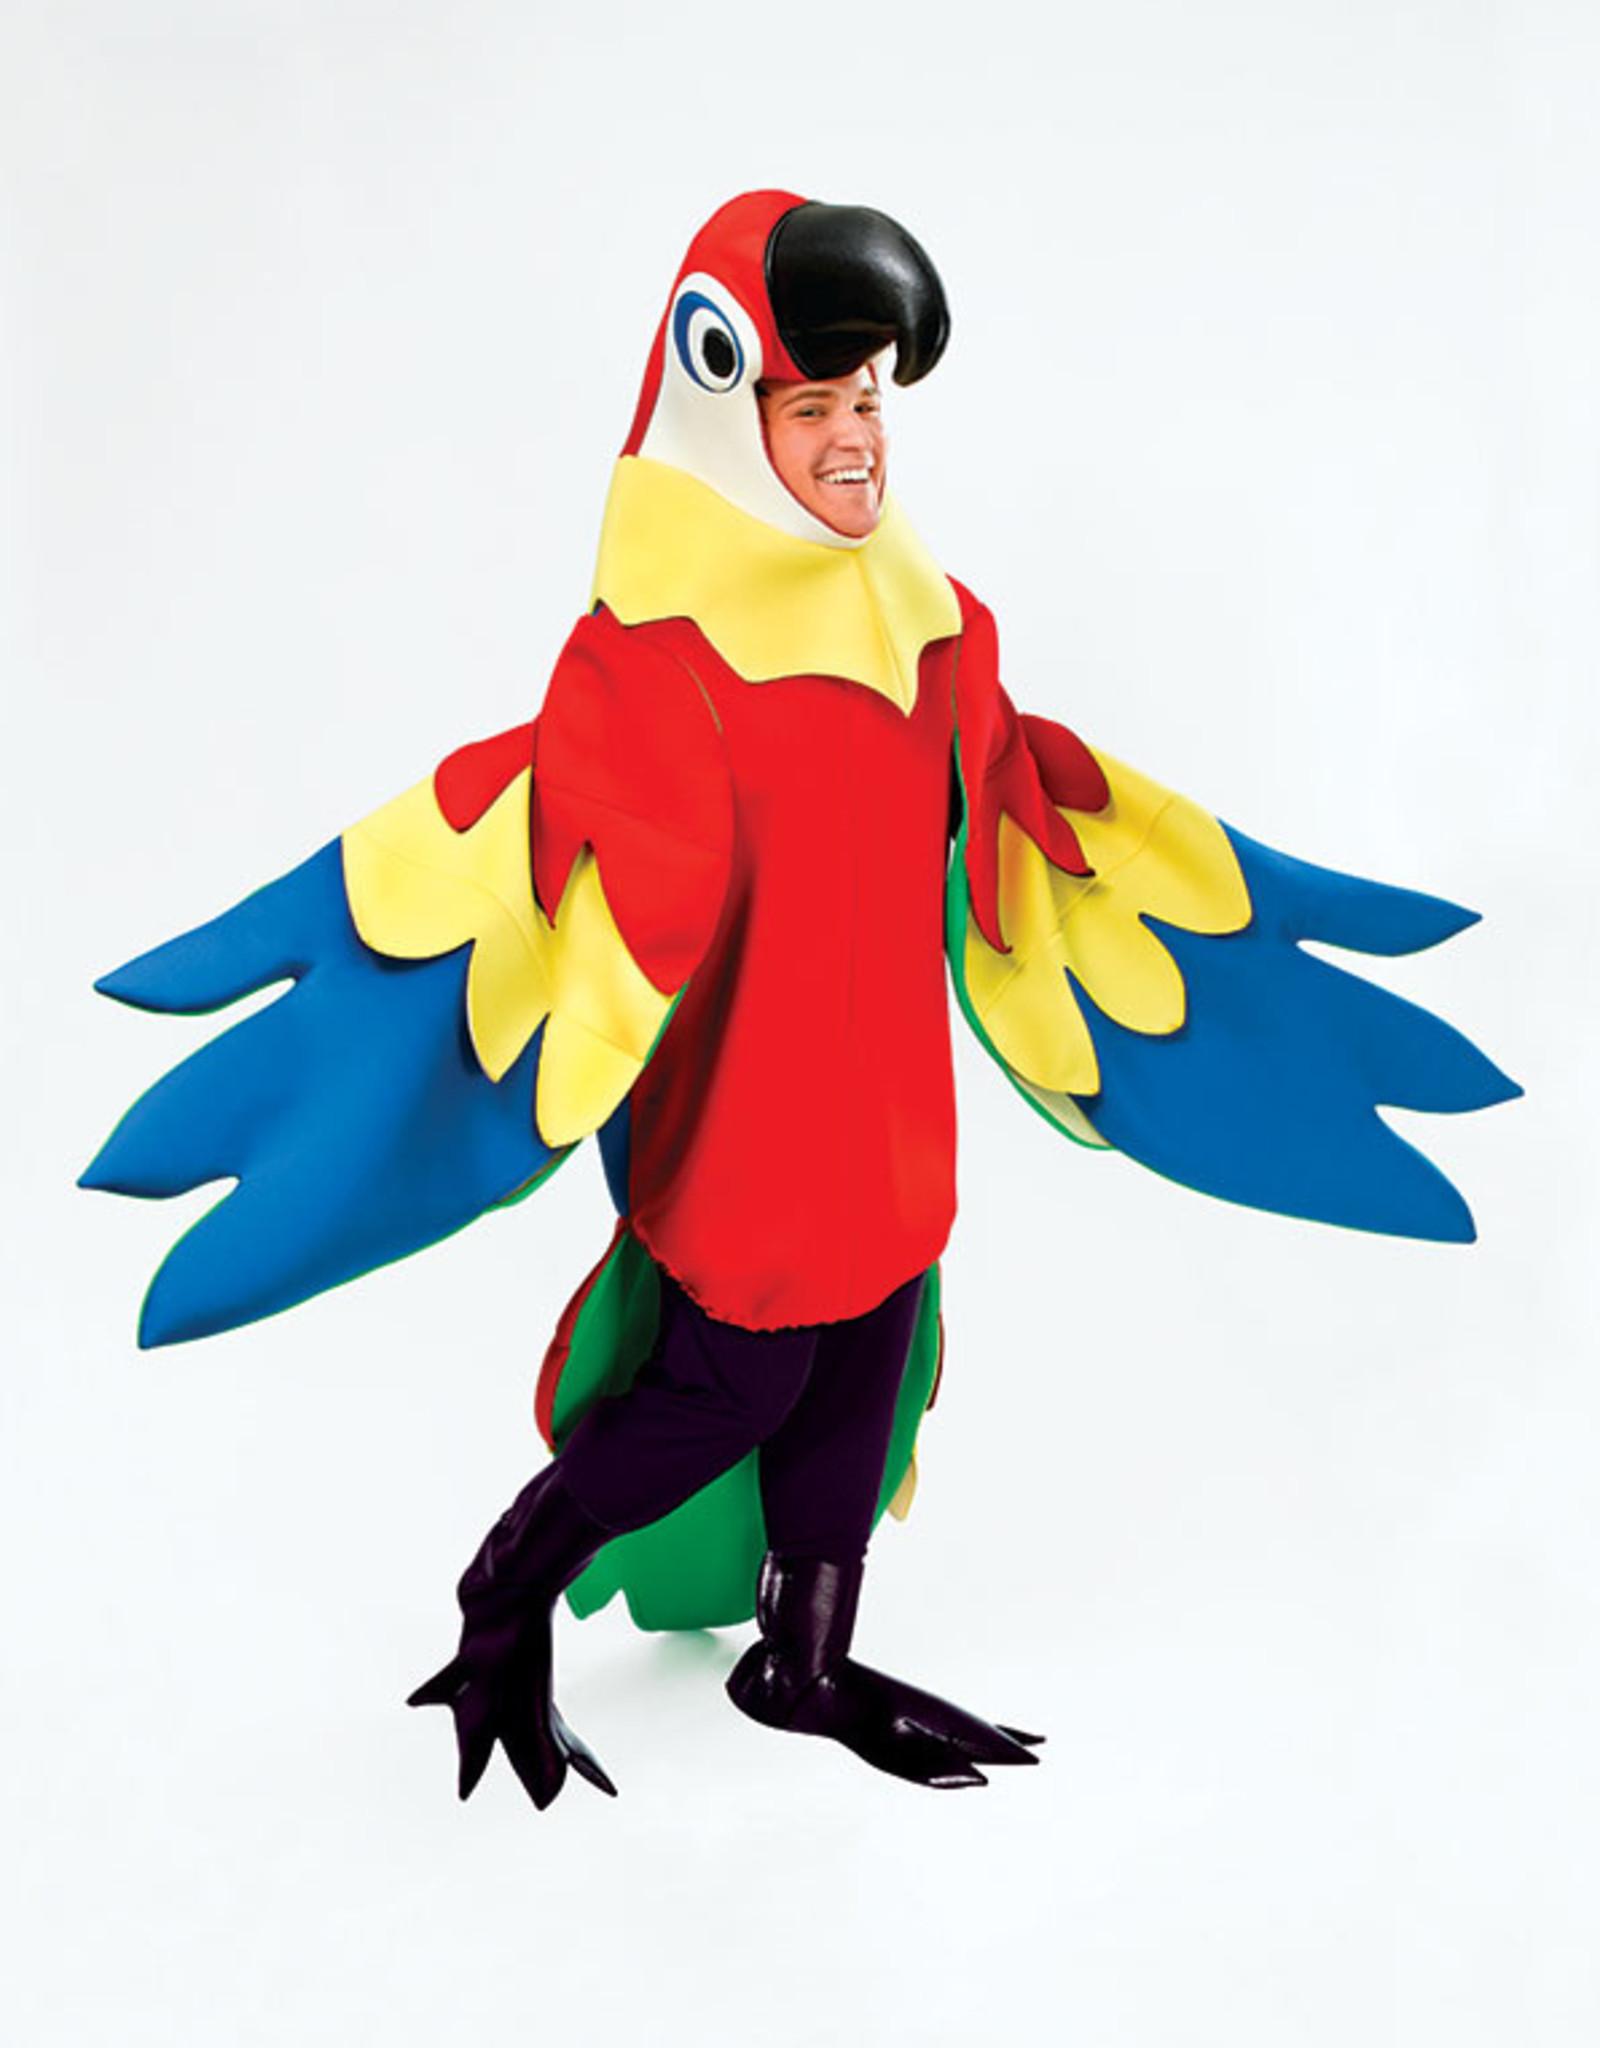 Bristol Novelty Ltd. papegaai huurprijs 30